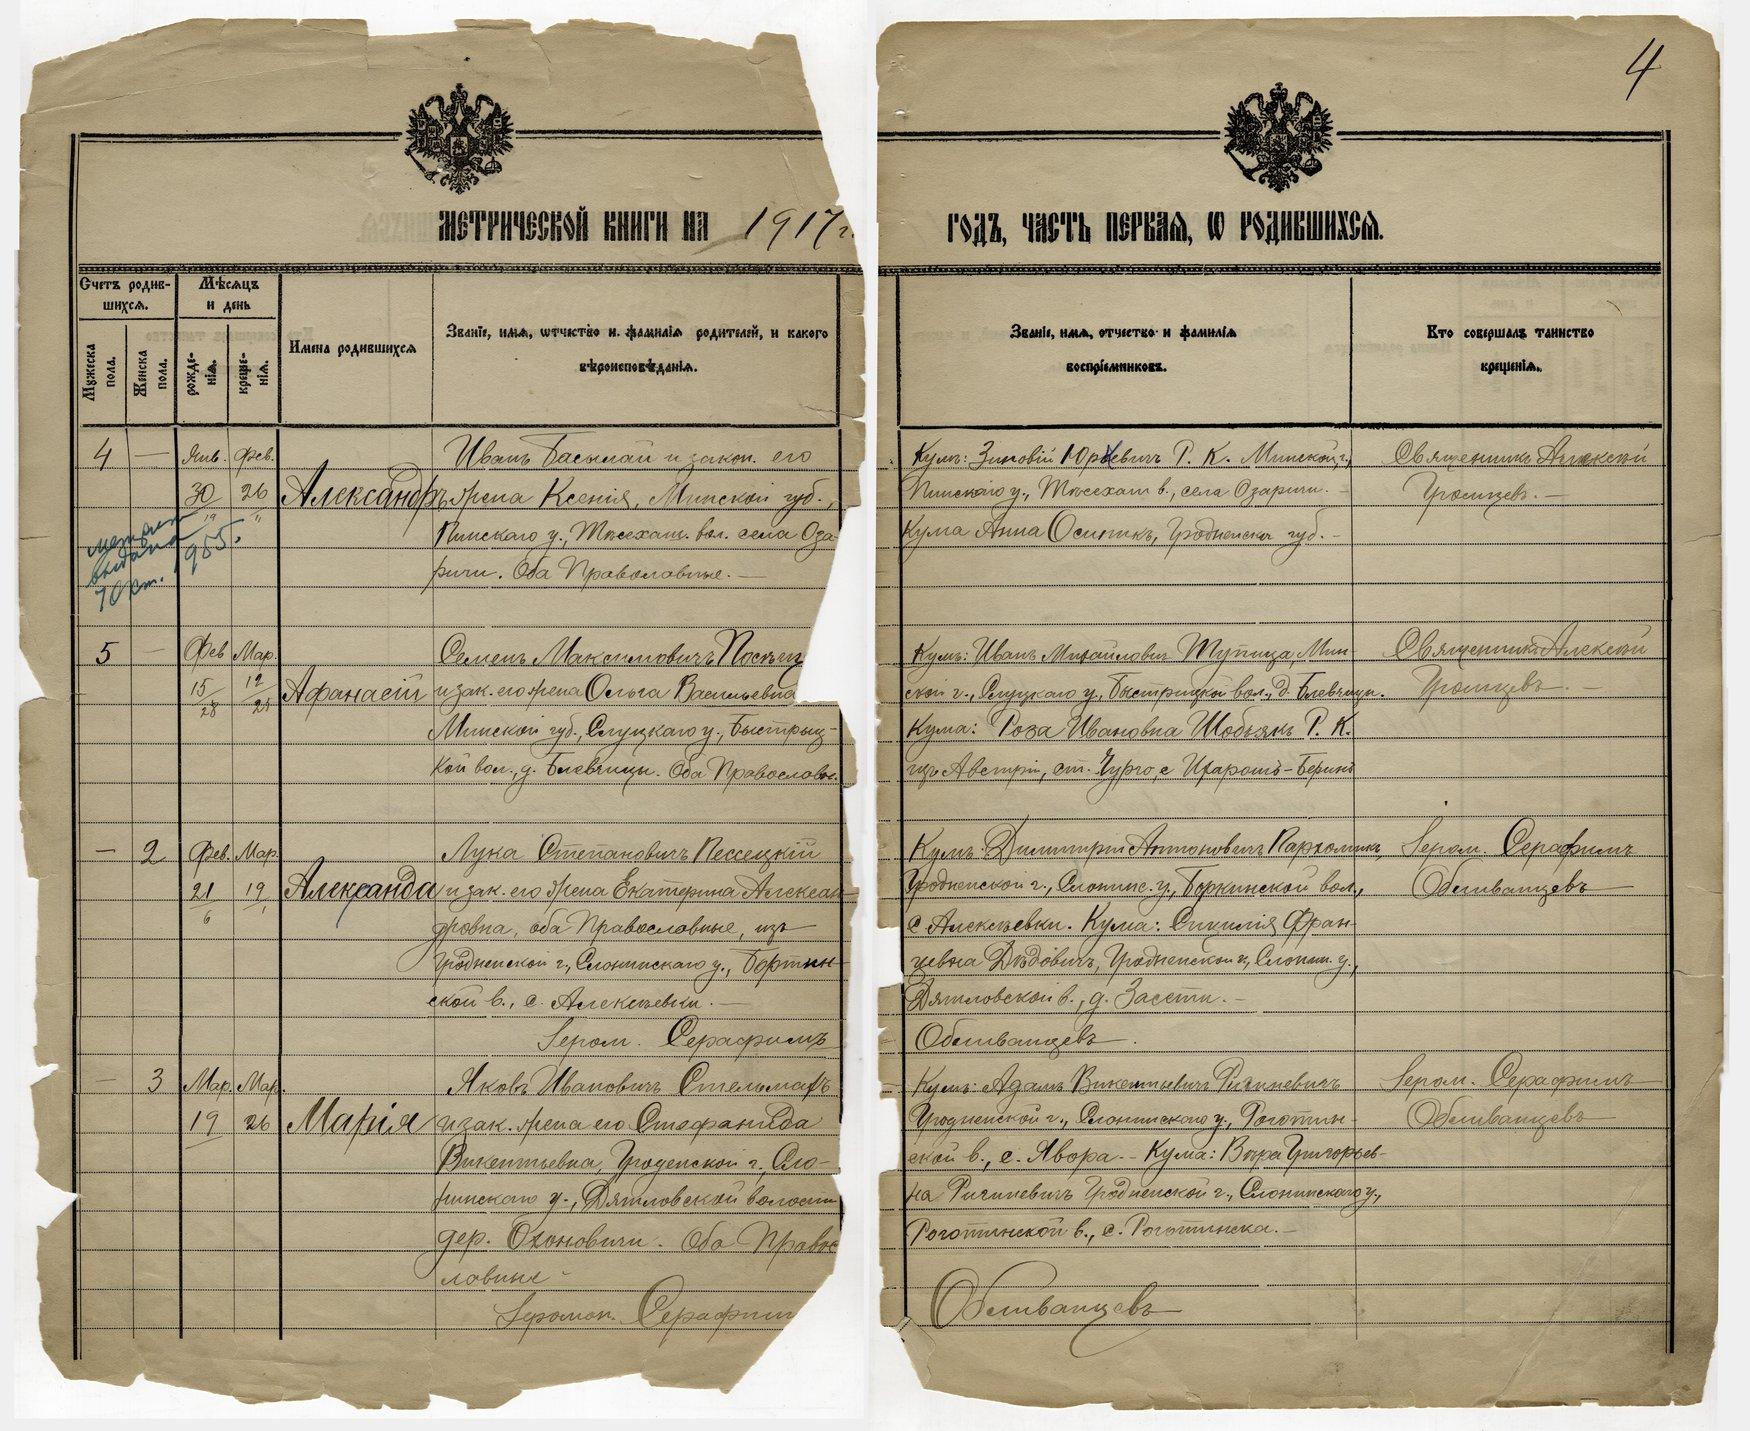 Birth, marriage and death register, Holy Trinity Russian Orthodox Church, Kansas City, Kansas - 1917 - 004 - Birth